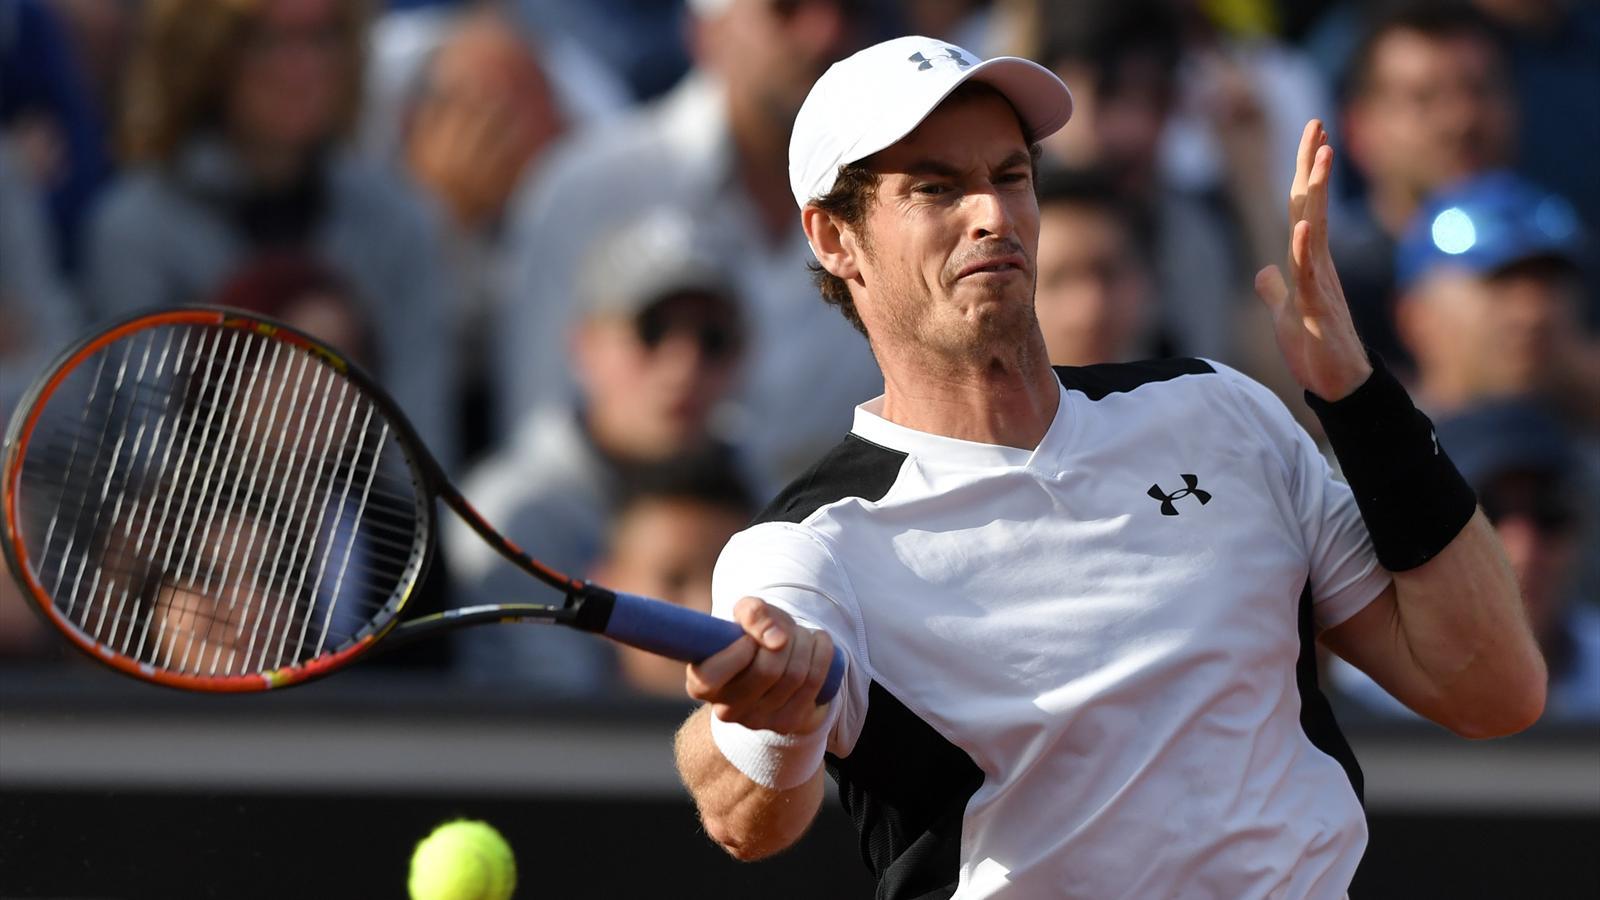 Murray beats Chardy to make Rome Masters quarter-finals - Tennis - Eurosport Australia